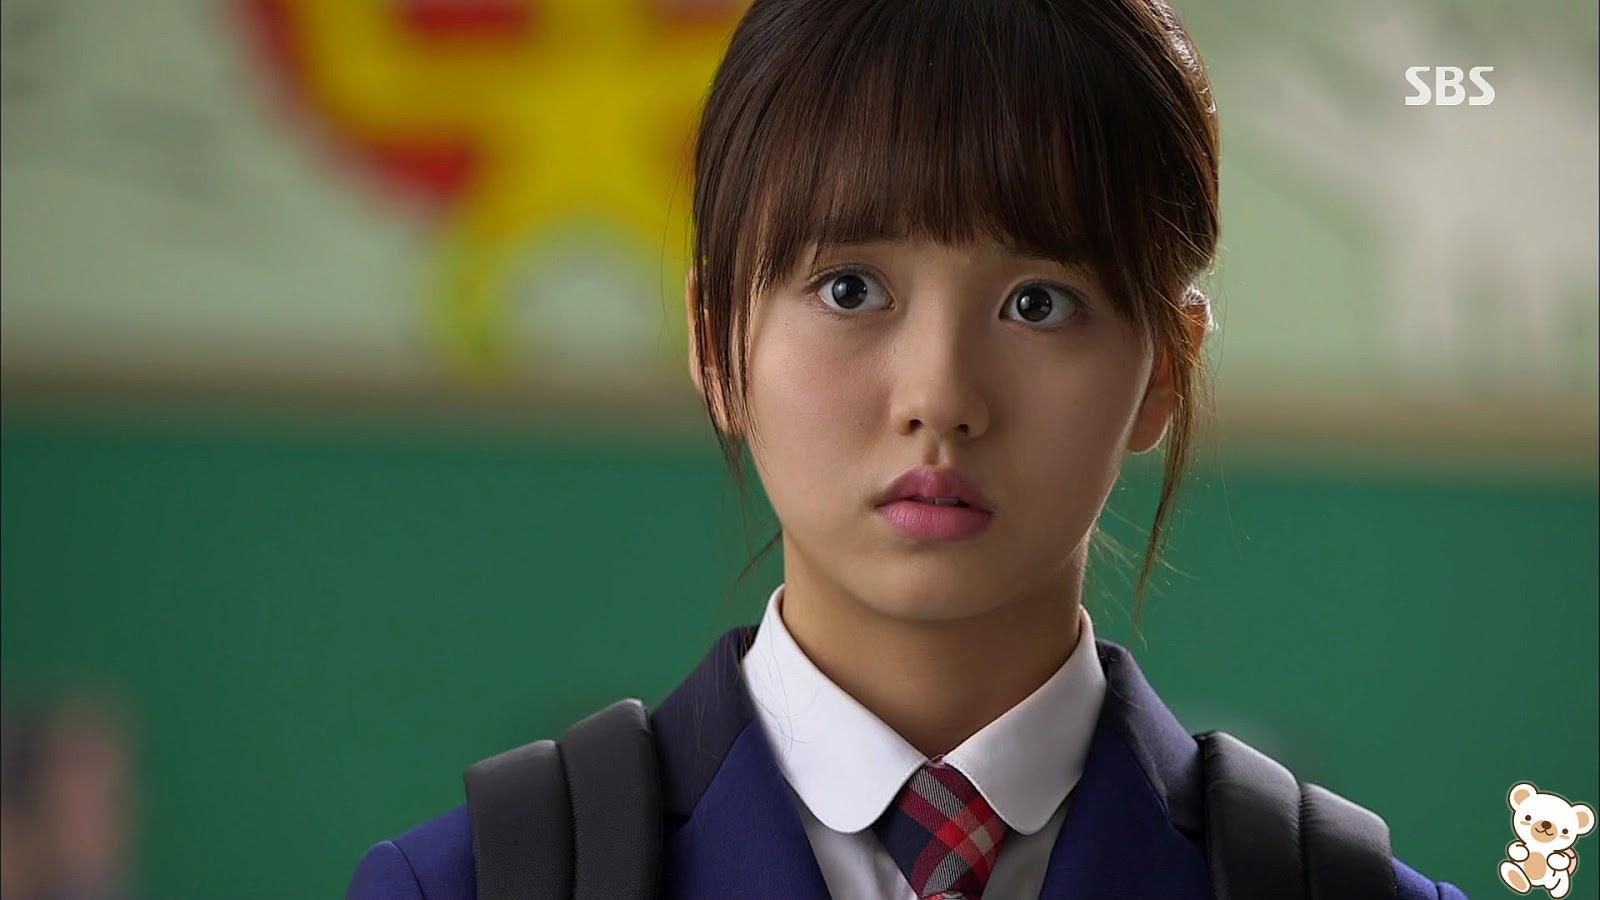 Korean Girls Discuss The Pressures of Wearing Makeup